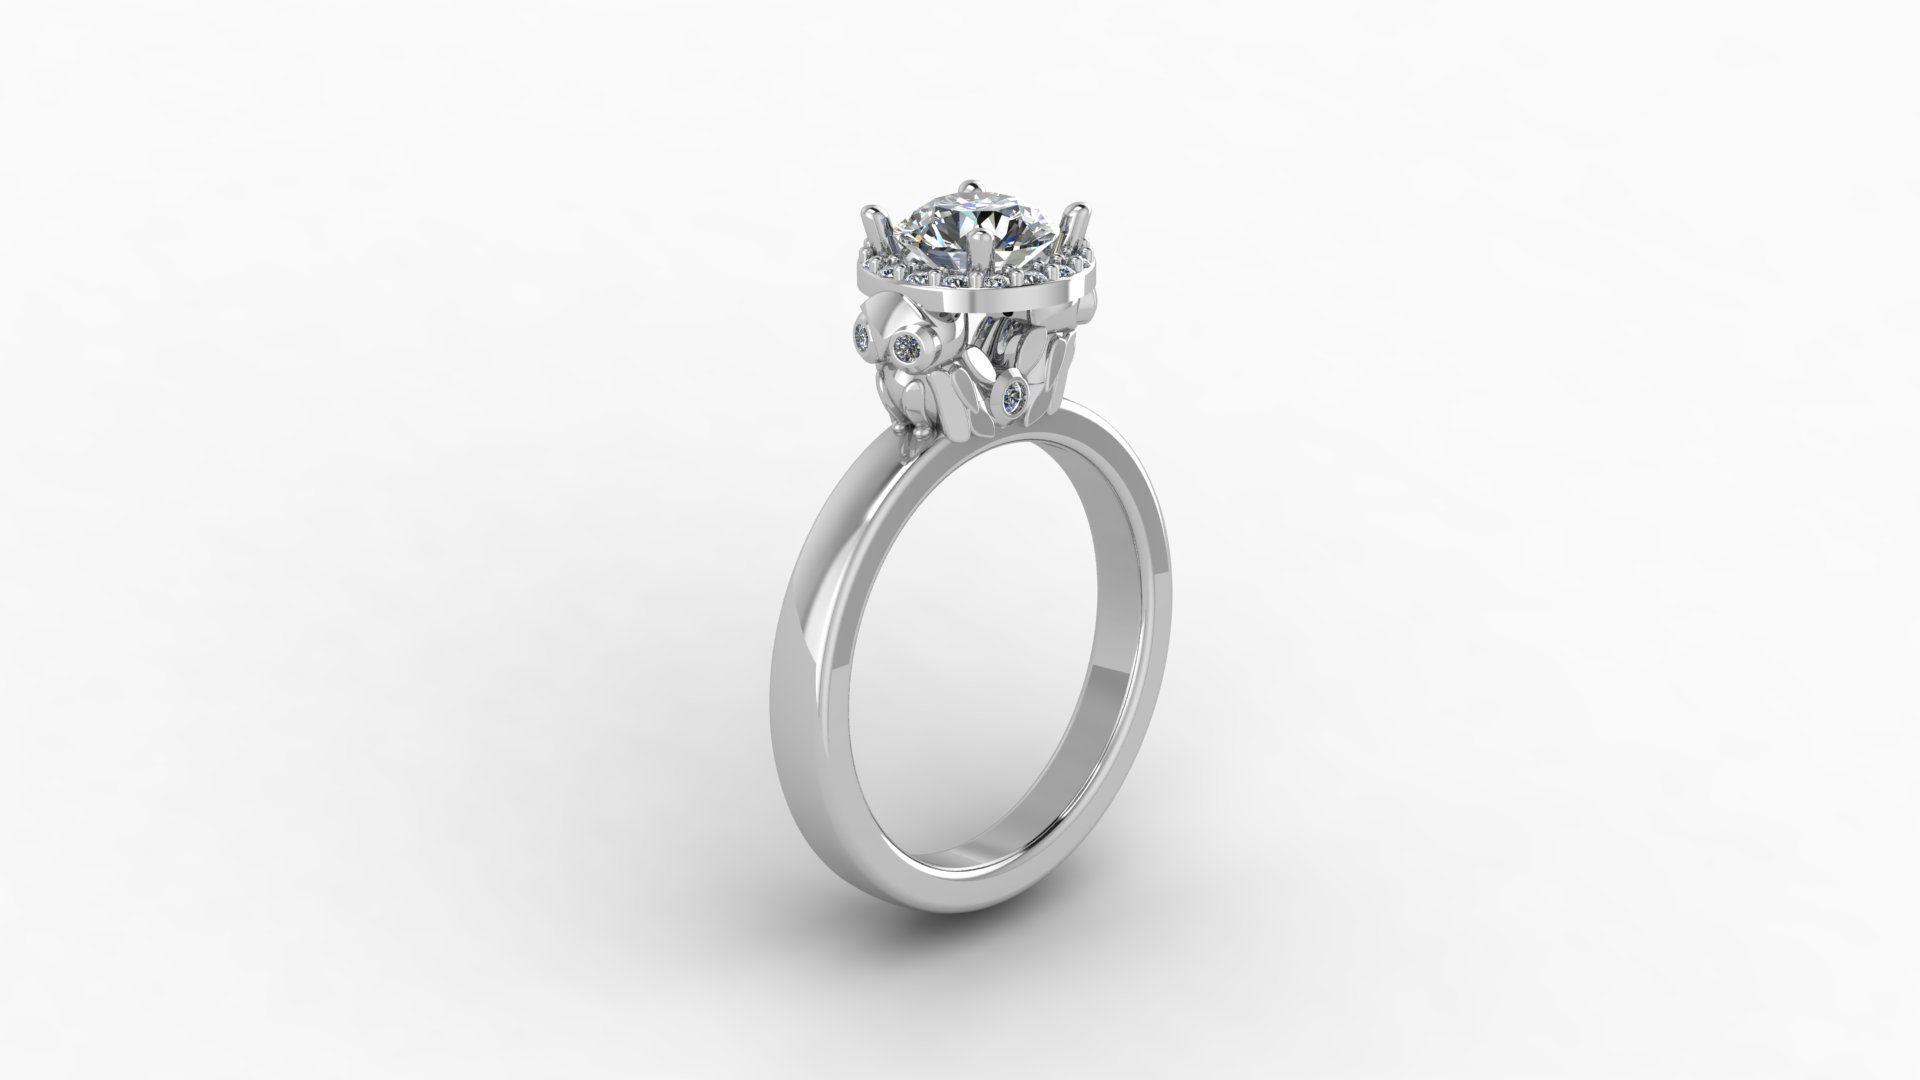 owl wedding rings owl wedding ring Owl wedding rings Owl Wedding Ring Delivery Fail Rings